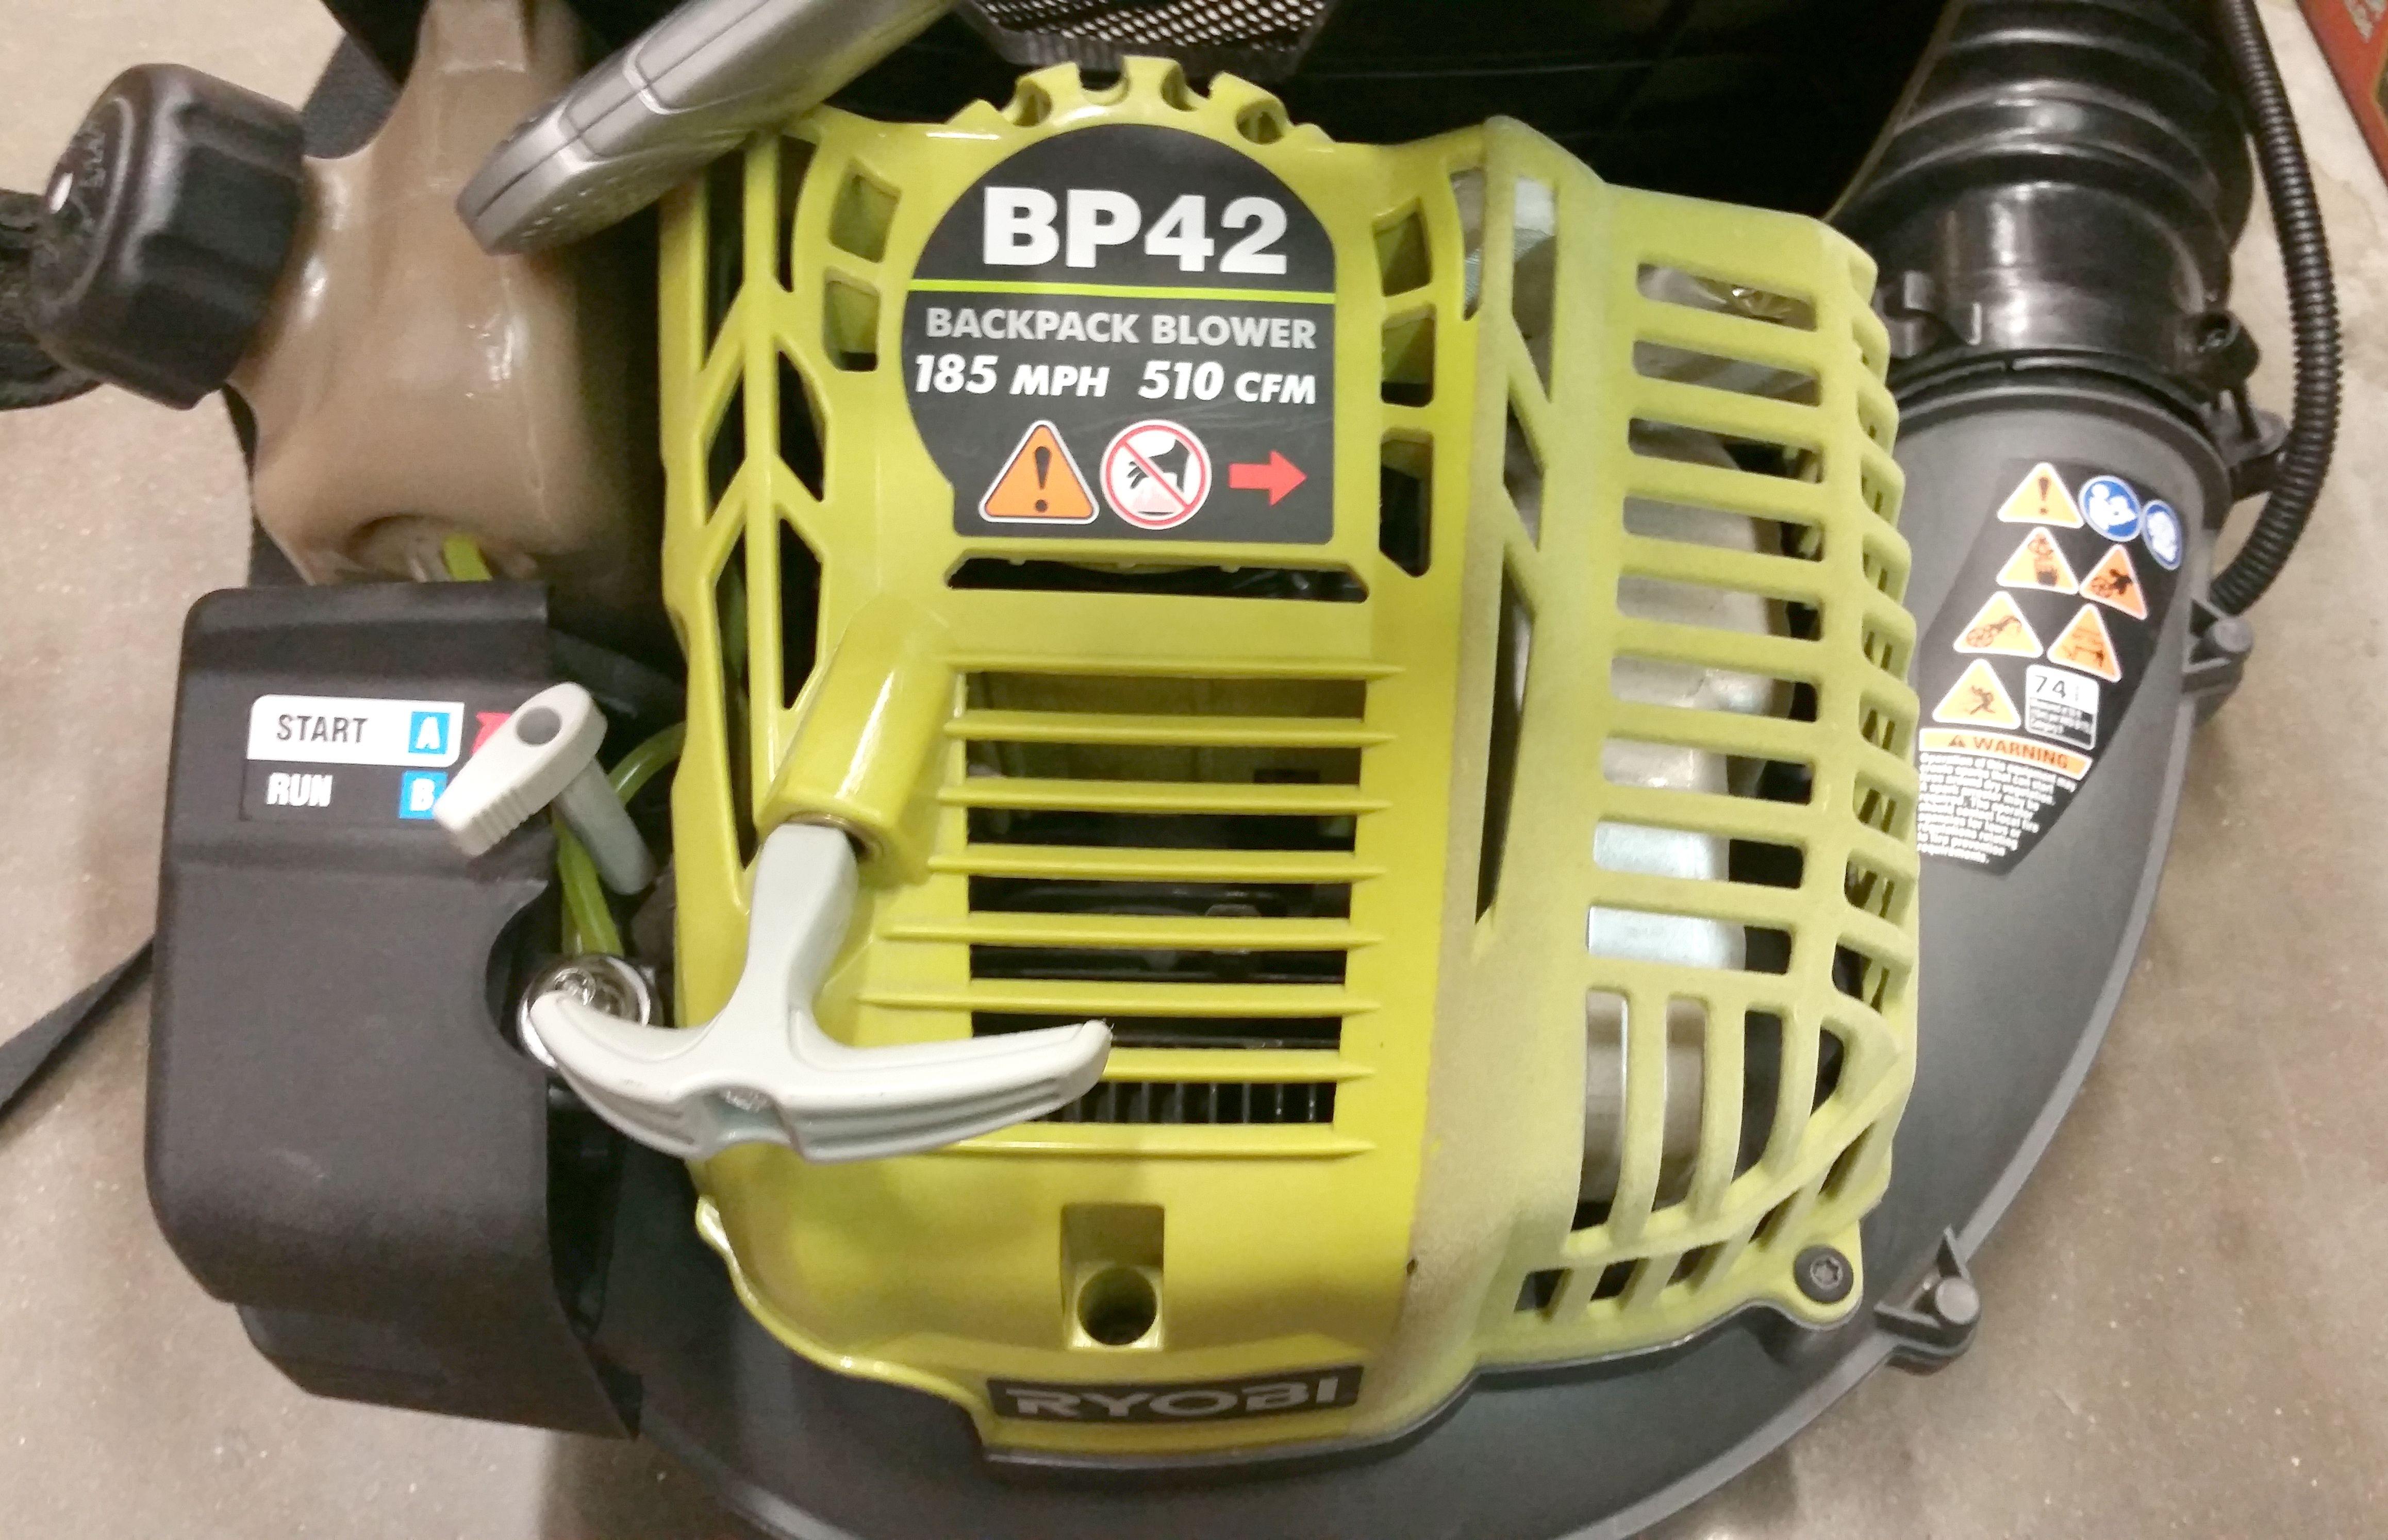 closer look at motor Outdoor power equipment, Backpacks